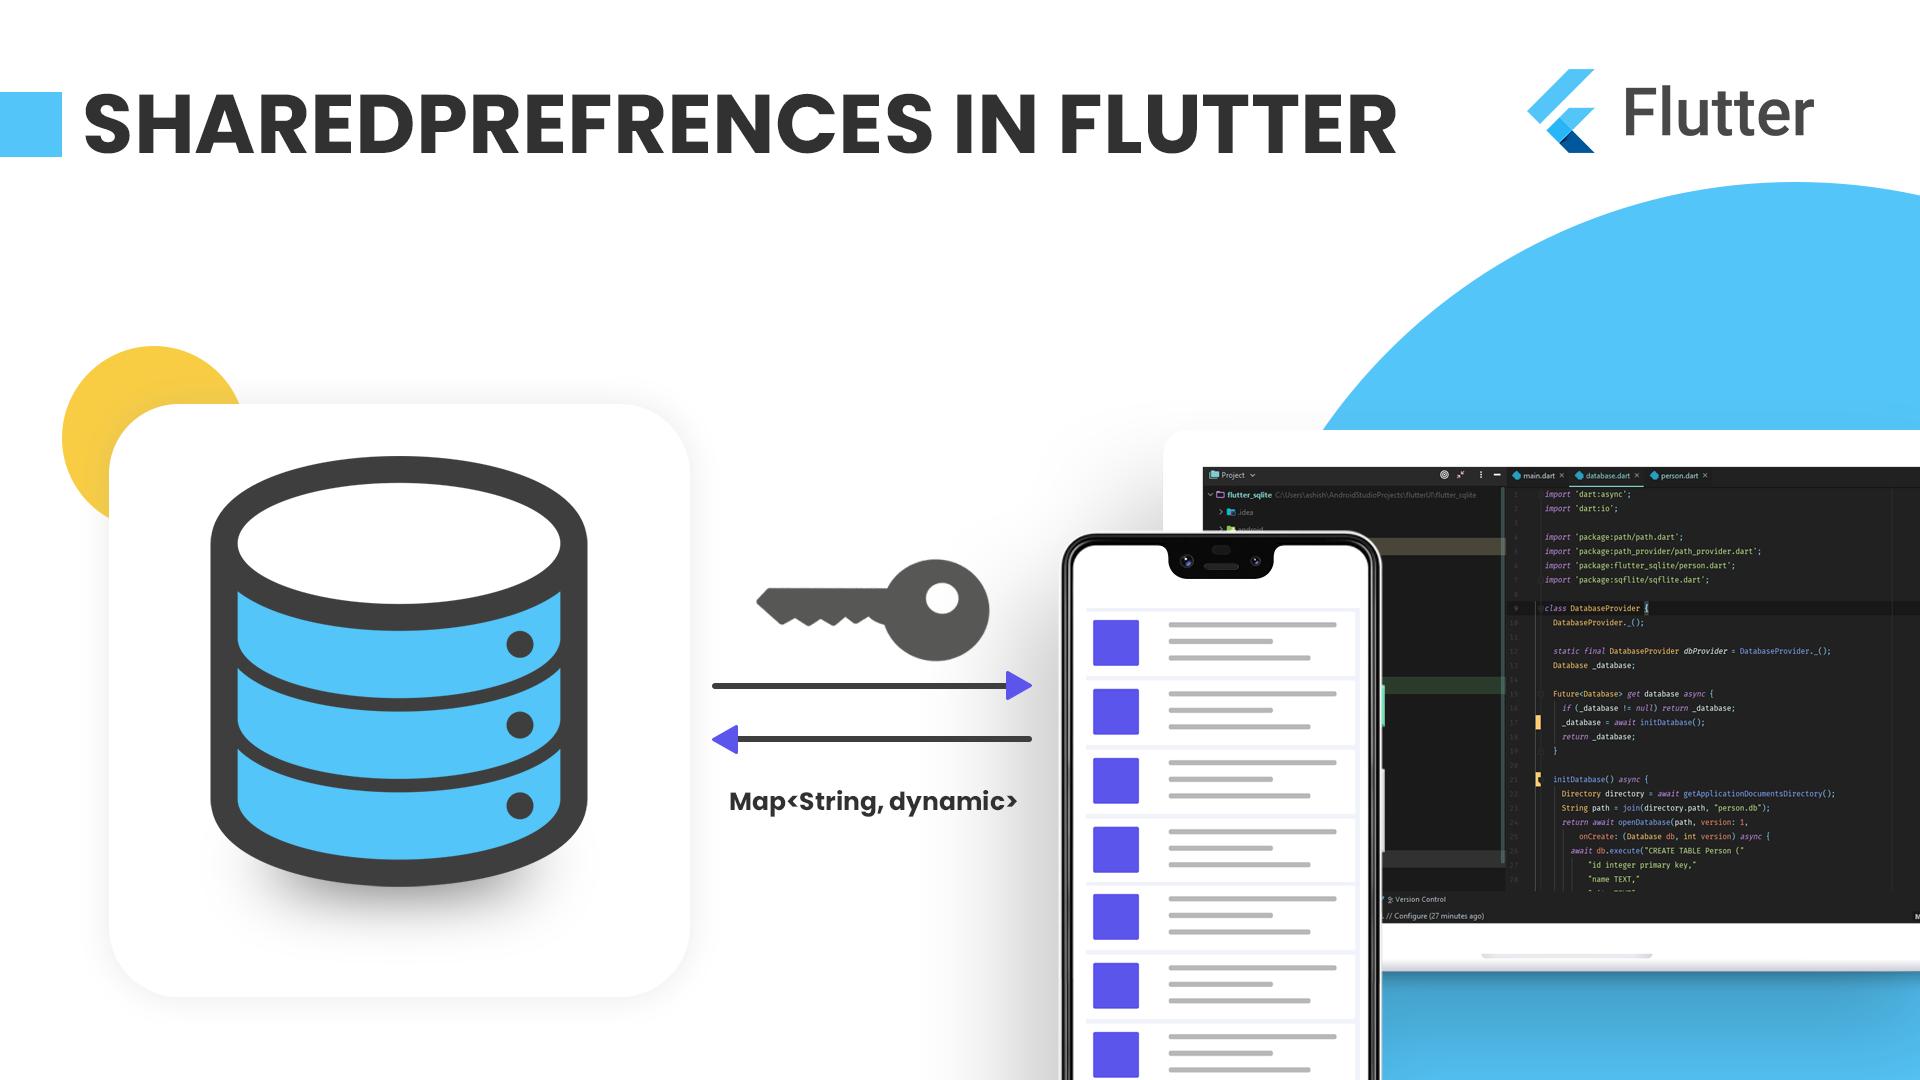 原生应用集成 Flutter SharedPreferences  的正确姿势